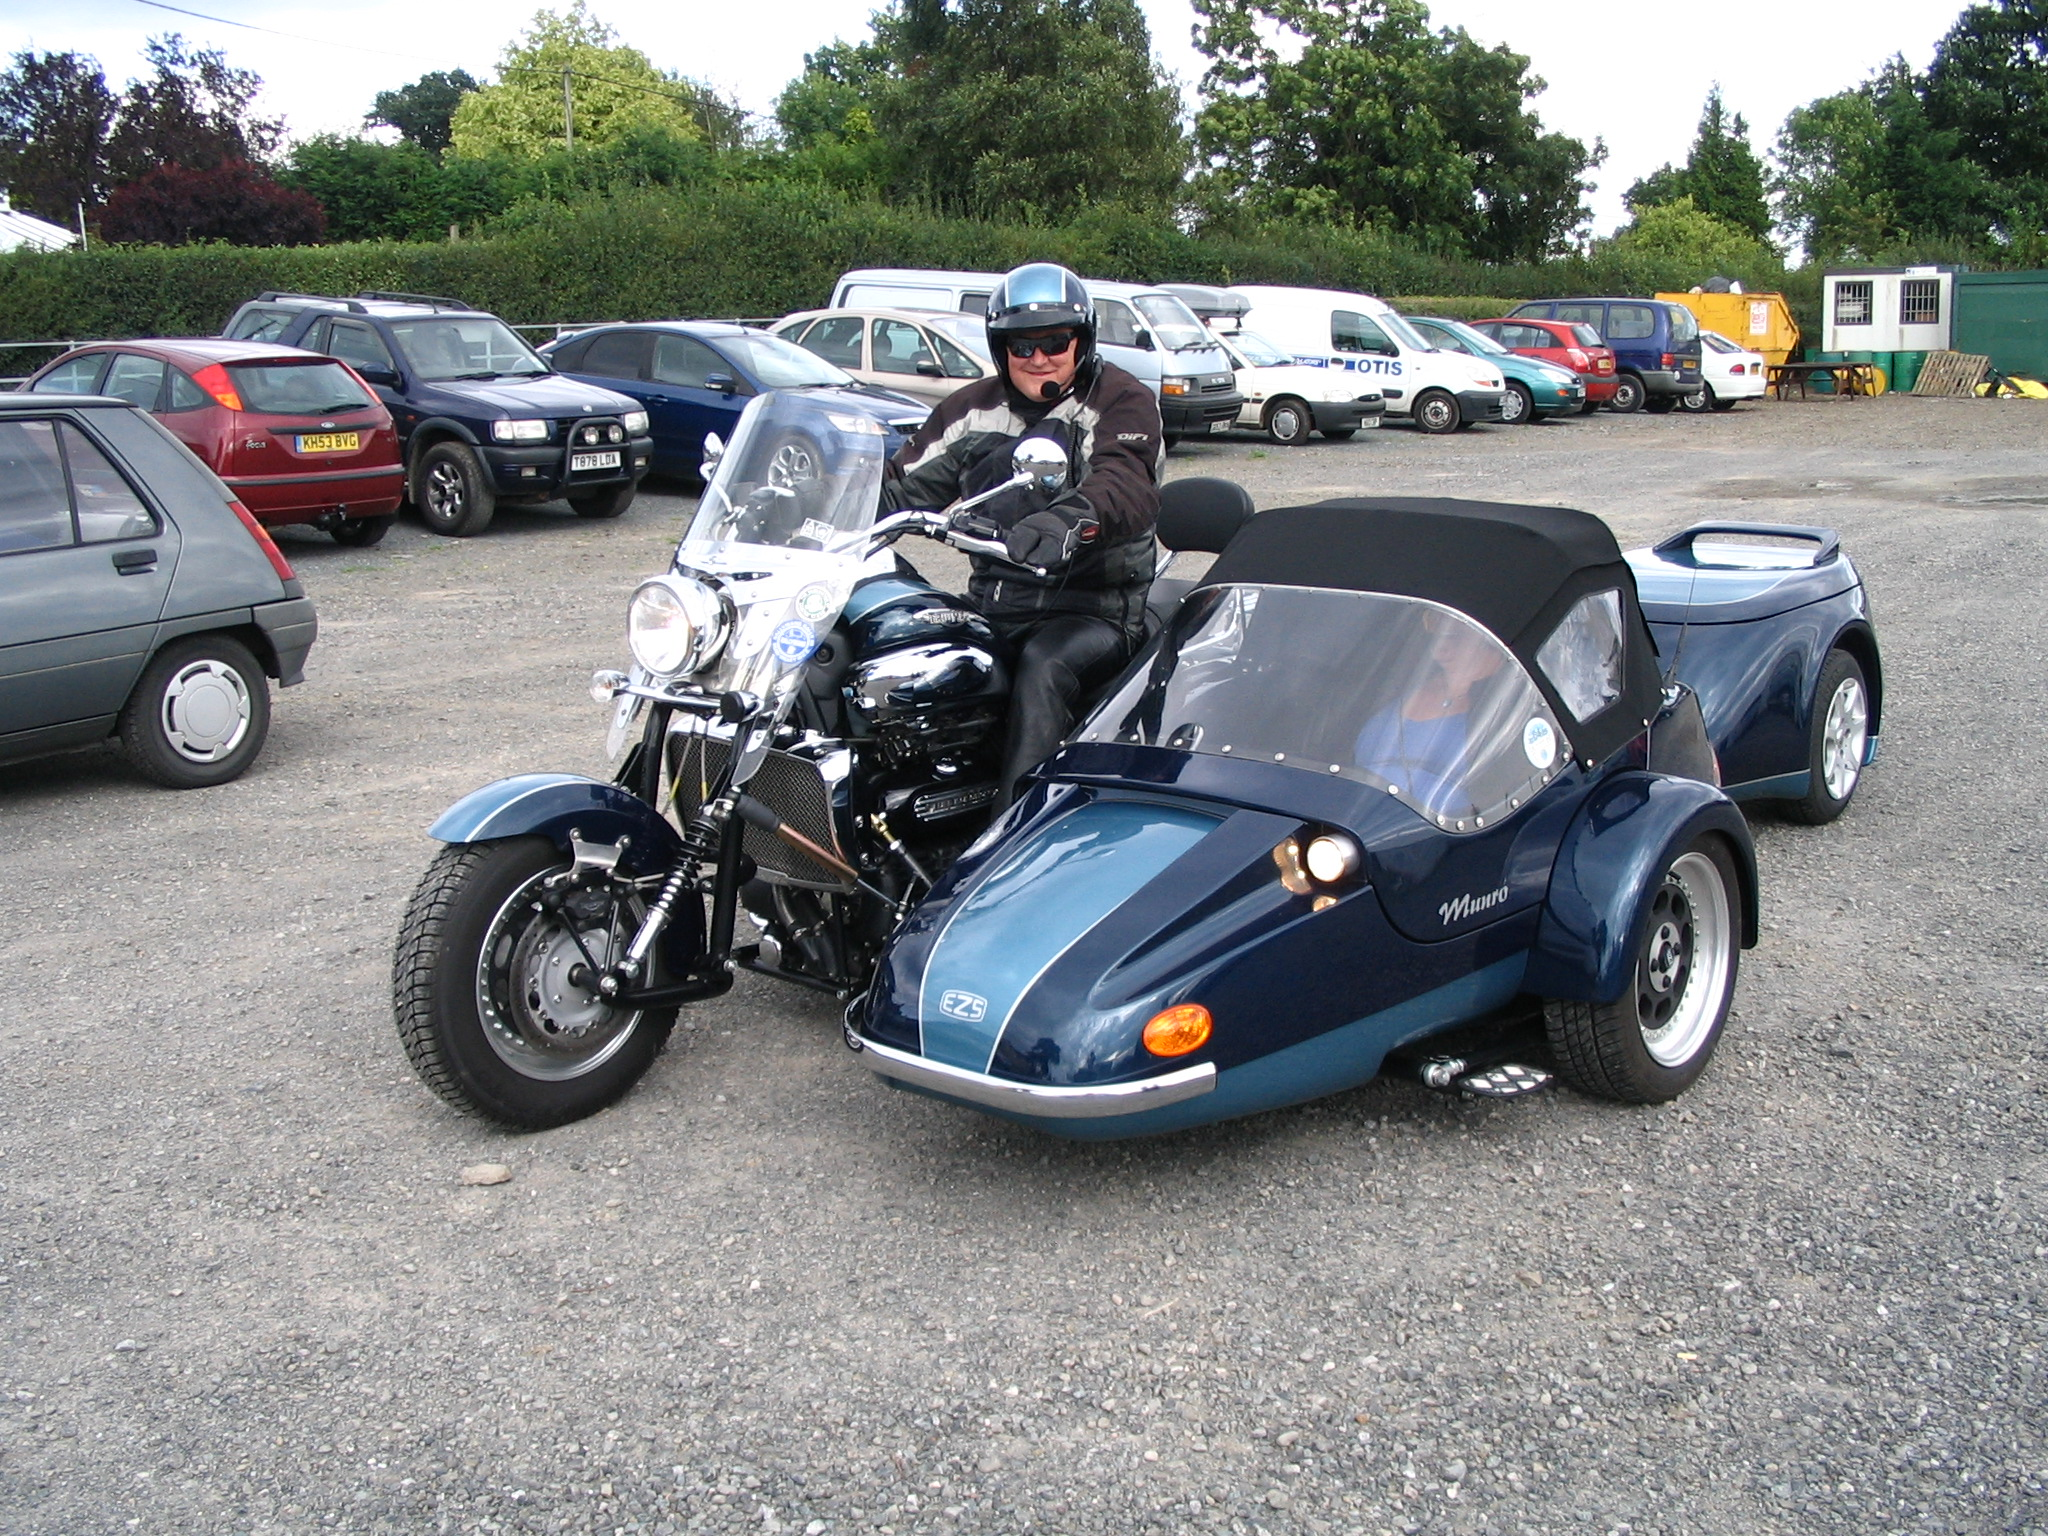 Ezs Sidecars